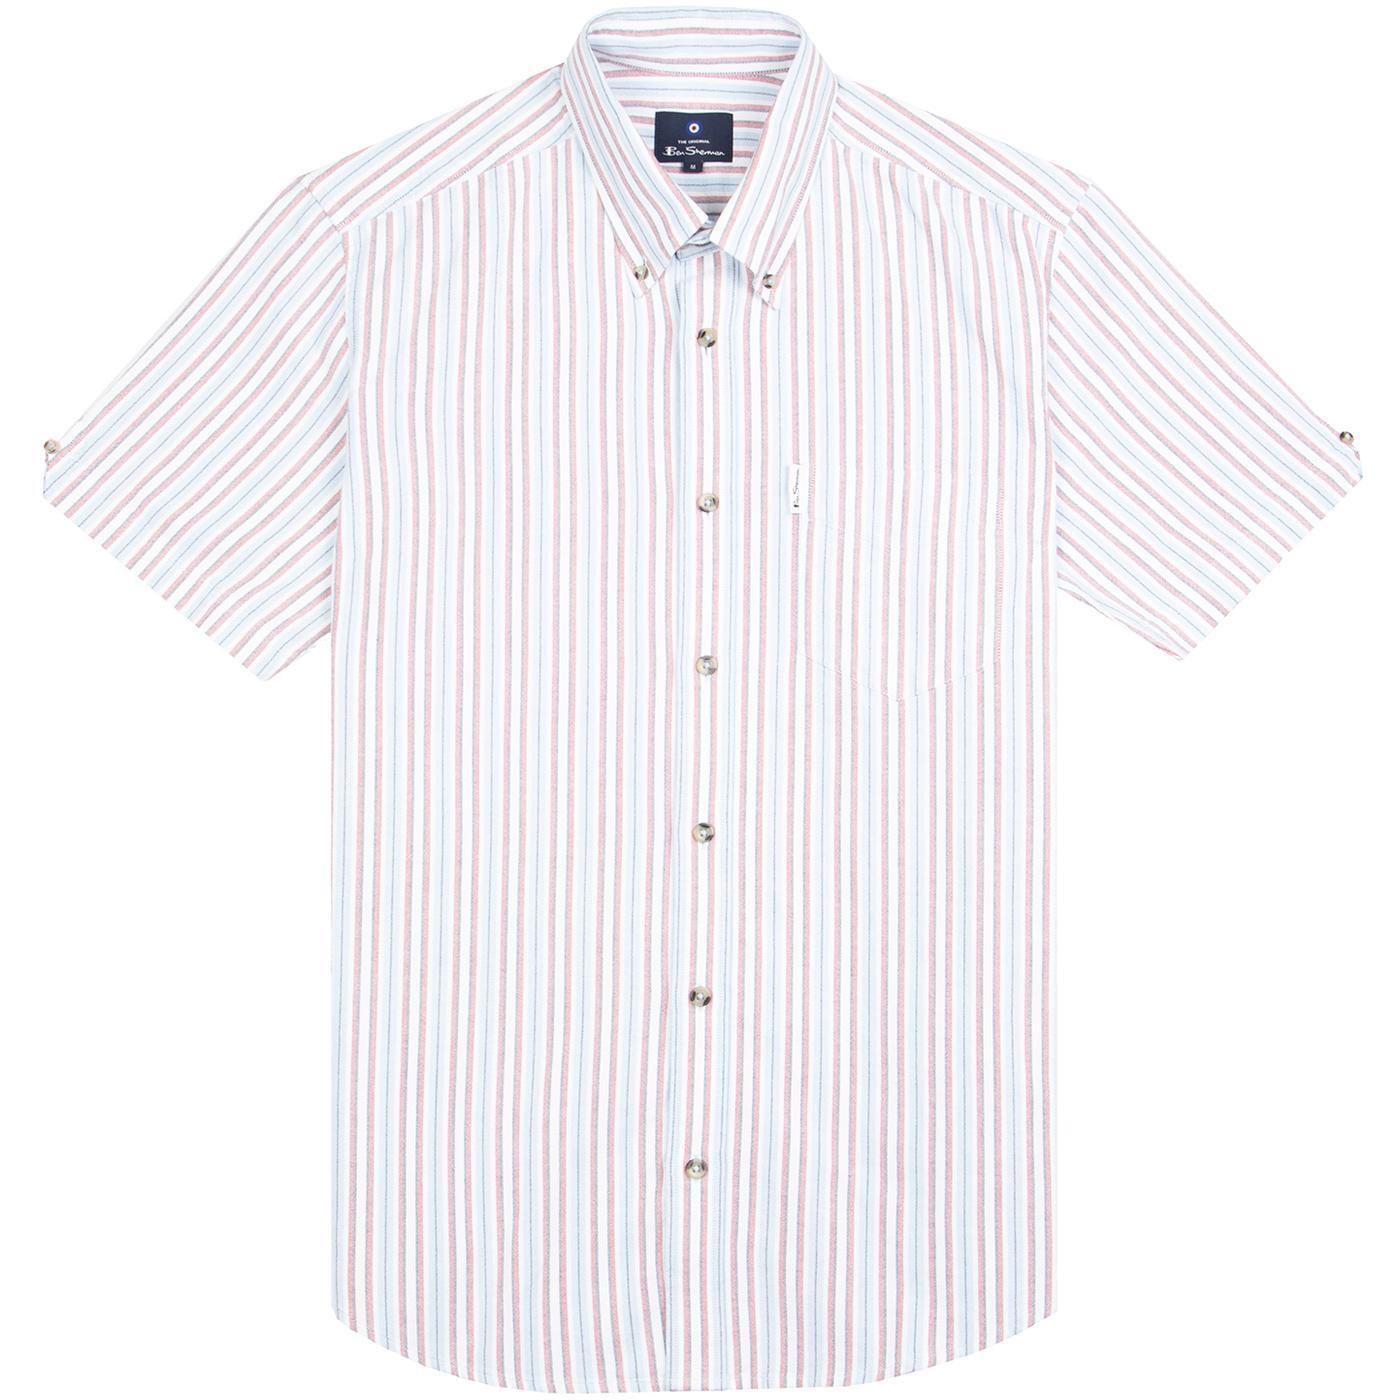 BEN SHERMAN Mod Stripe Yarn Dyed Oxford Shirt SKY